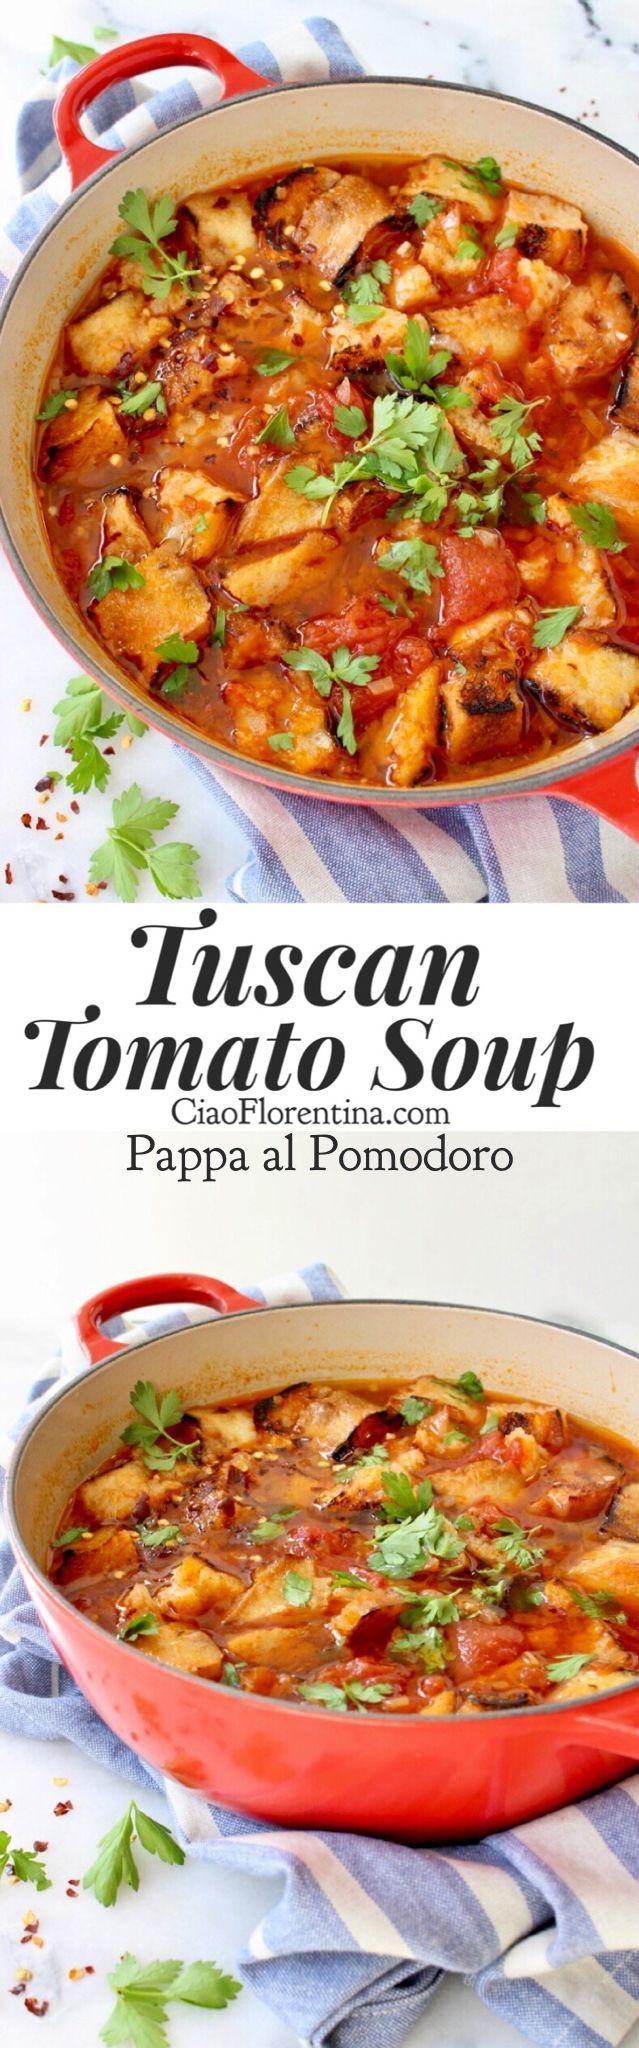 Authentic Tuscan Tomato Soup Recipe or Pappa al Pomodoro with Bread and Herbs | CiaoFlorentina.com @CiaoFlorentina